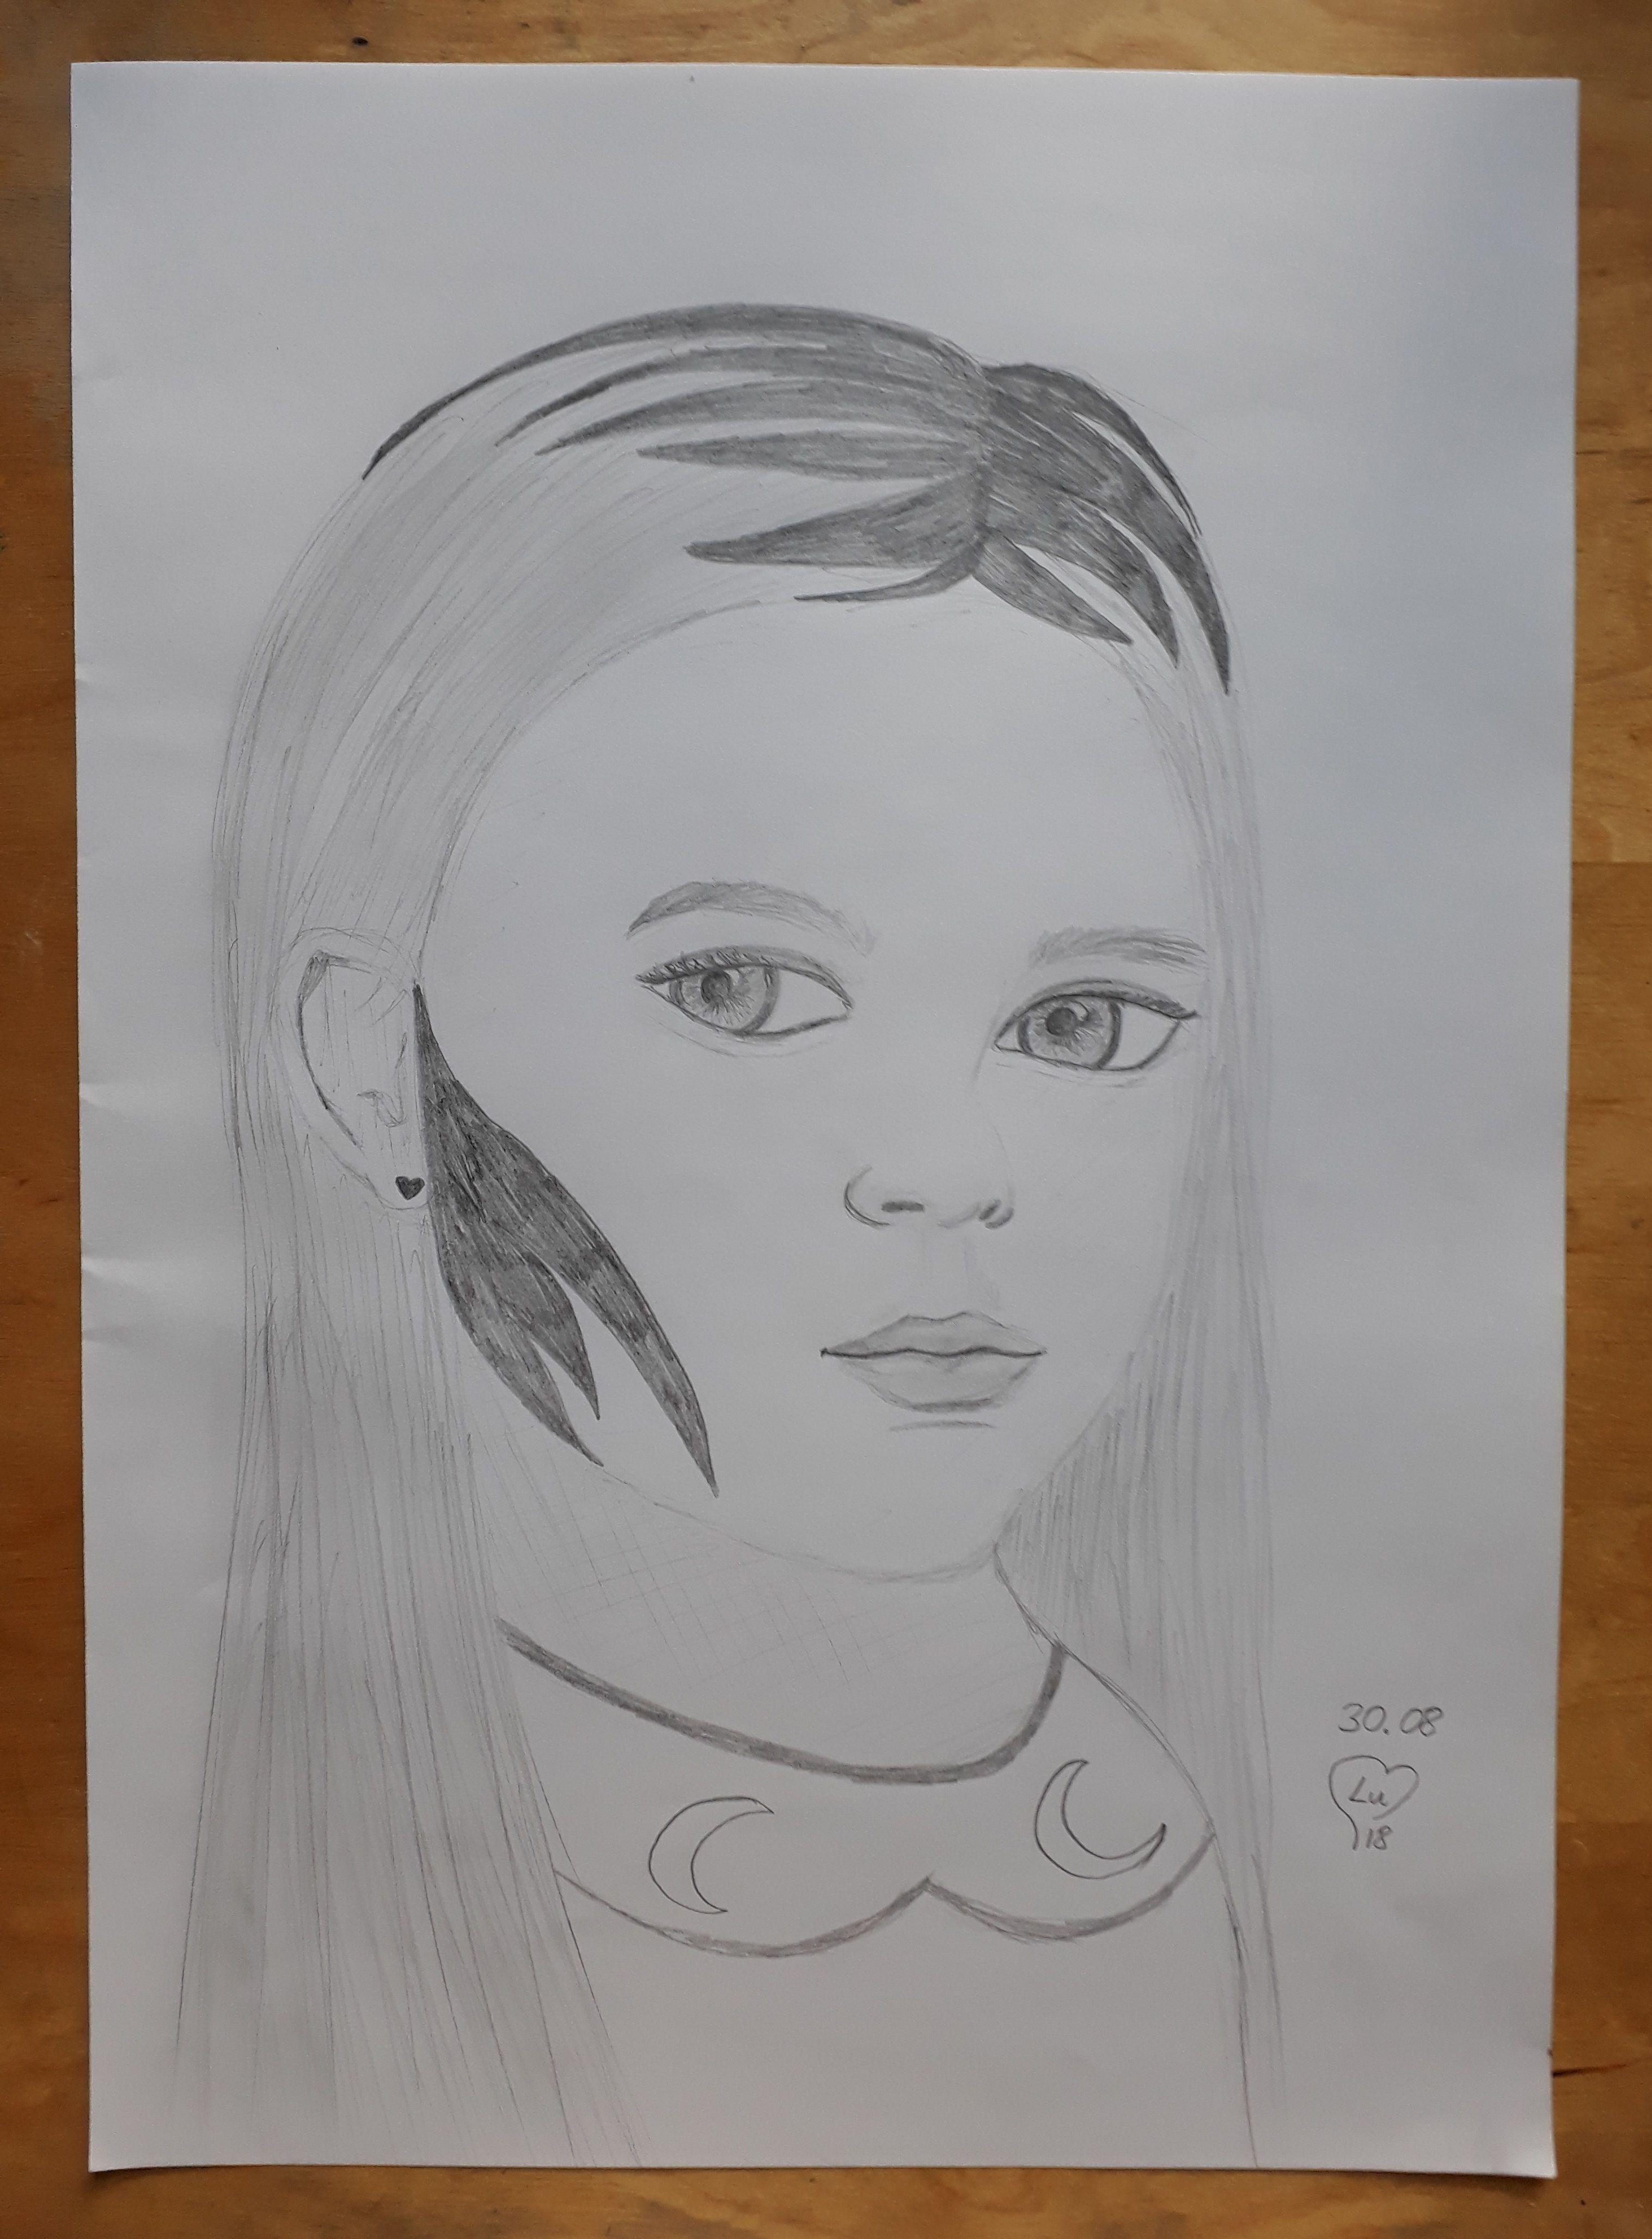 Moon girl modern art for sale beautiful sketches art world beautiful moments